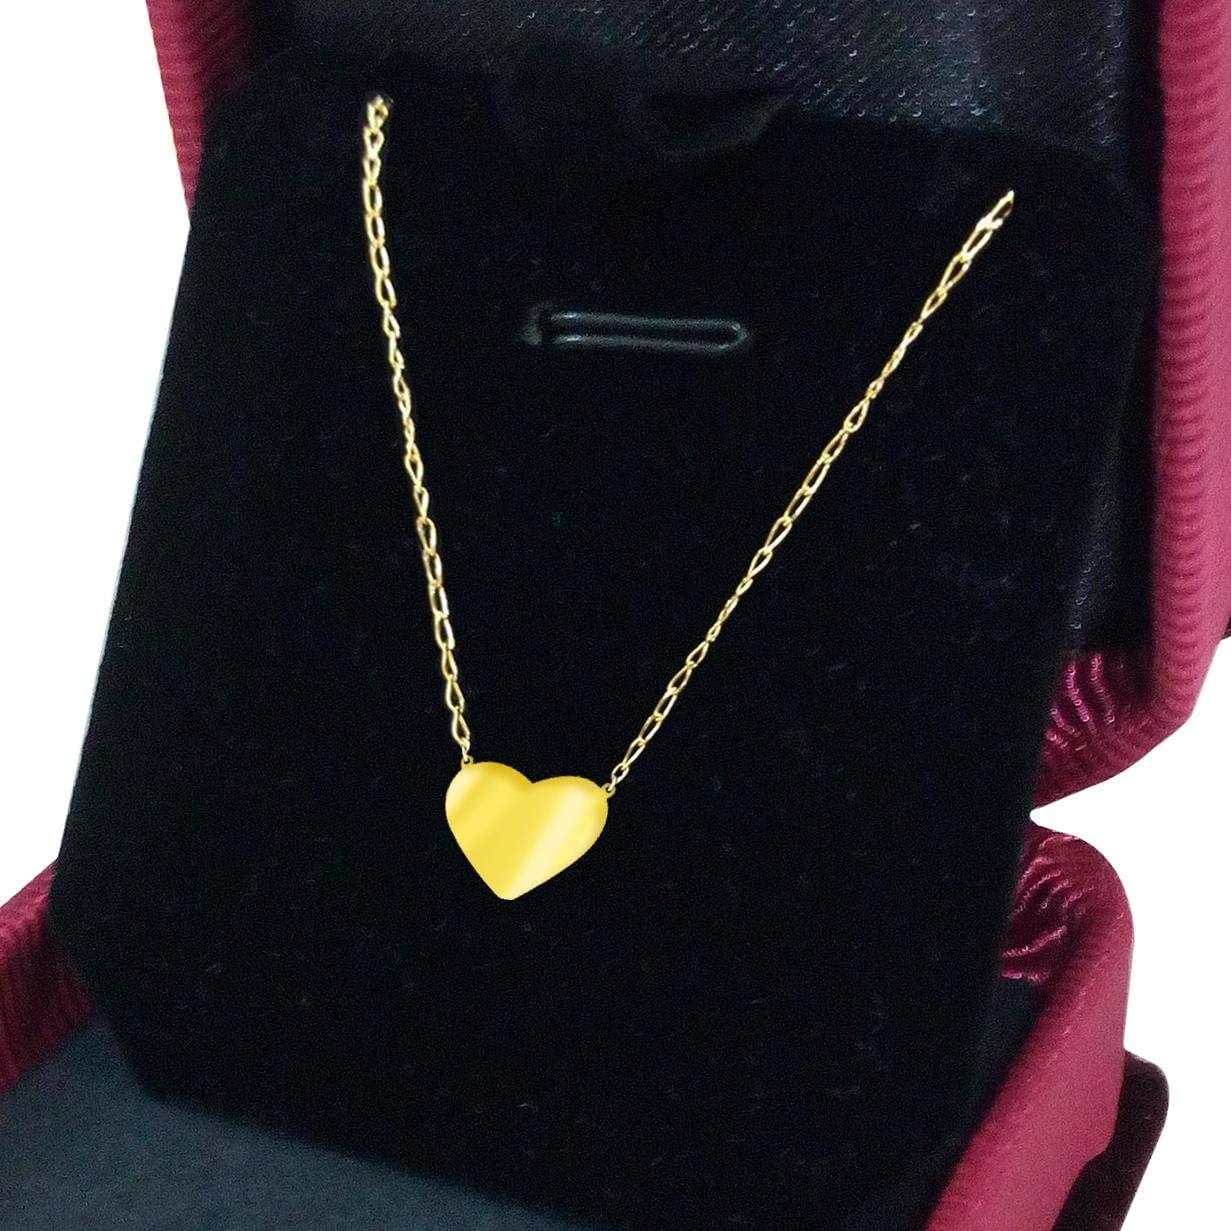 18k Gold Necklace Shaped Heart Price In Saudi Arabia Amazon Saudi Arabia Kanbkam